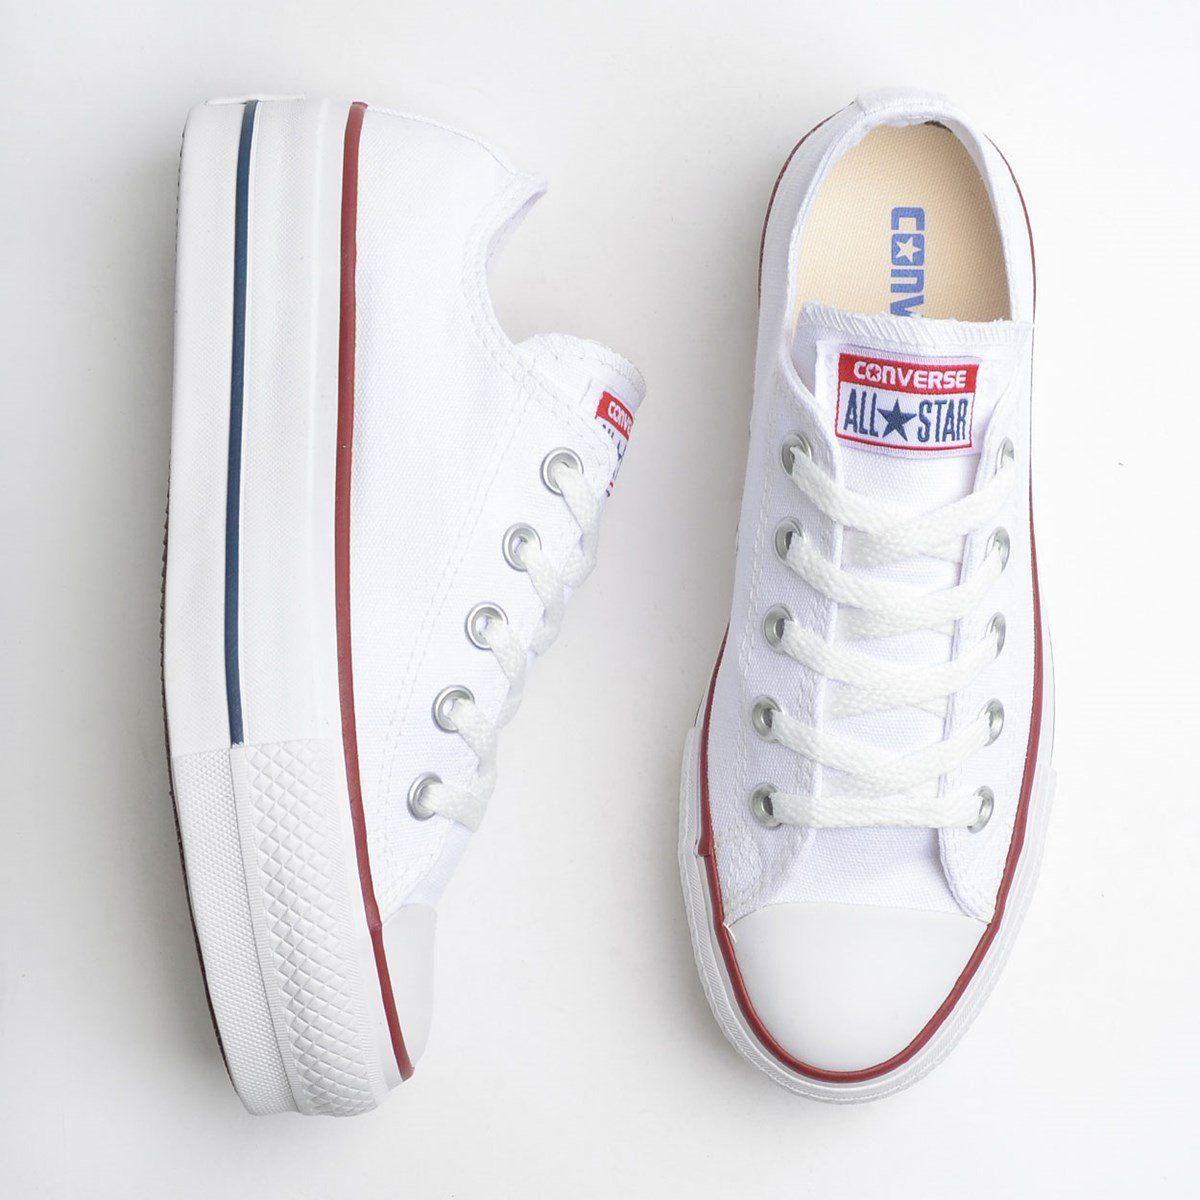 ea2c4aec Tênis Converse Chuck Taylor All Star Plataforma Branco/Branco/Marinho -  Overcome Clothing